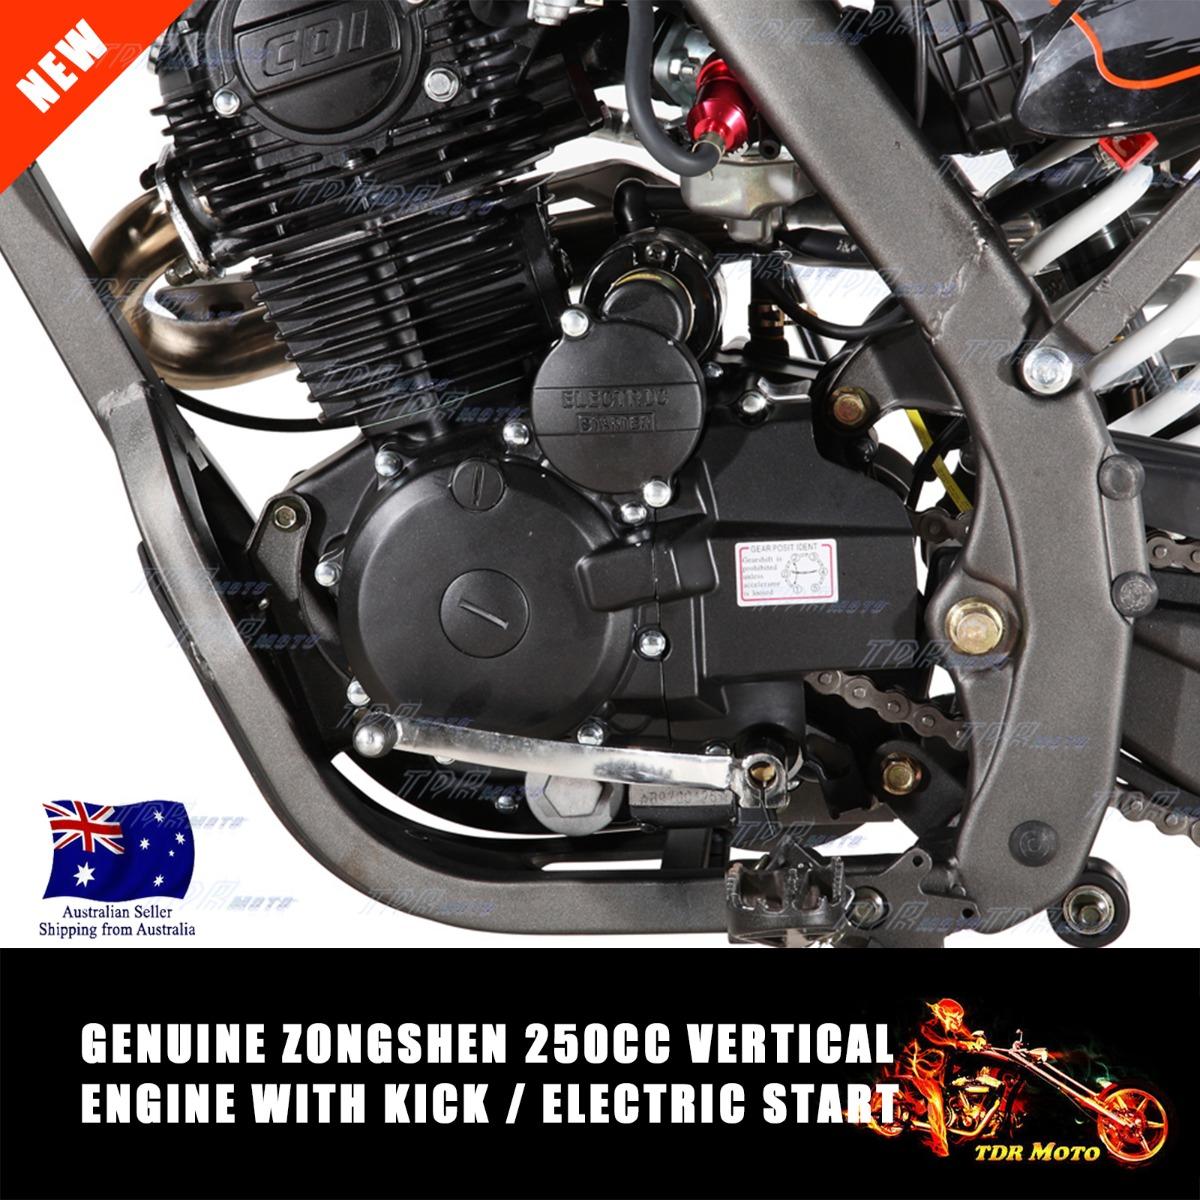 zongshen 250 wiring harness zongshen image wiring 250cc zongshen ohc air cooled engine motor wiring loom harness on zongshen 250 wiring harness